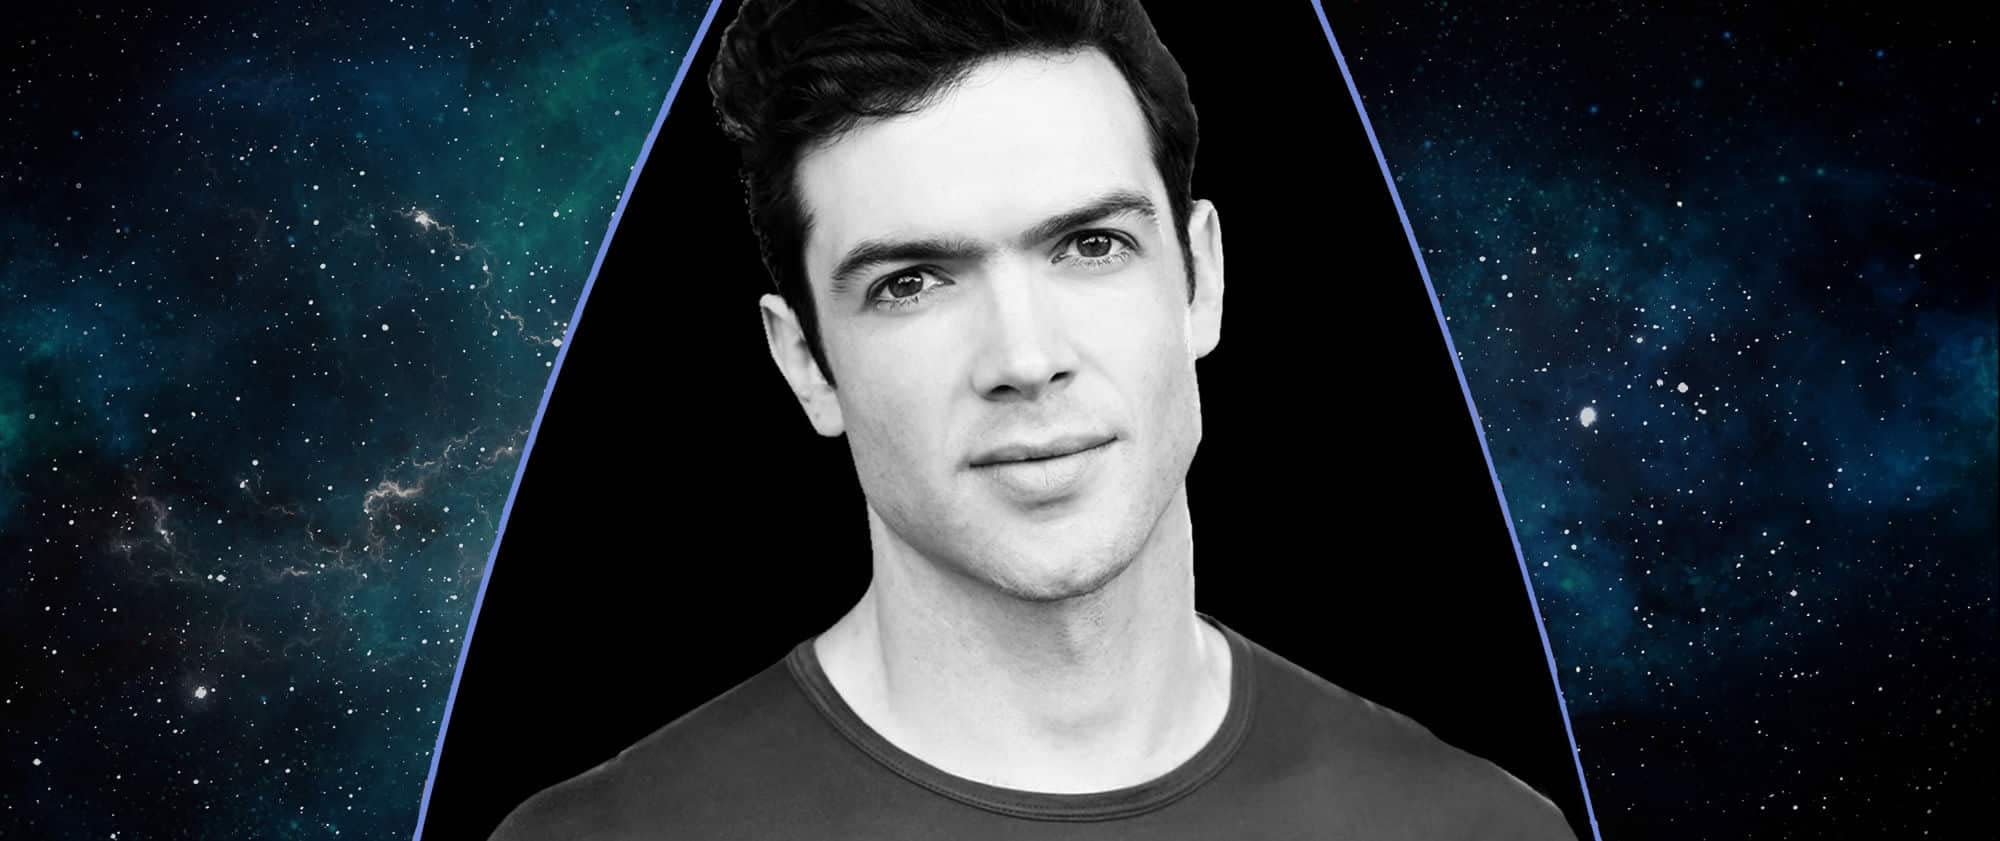 'Star Trek: Discovery' Casts Their Mr. Spock for Season 2